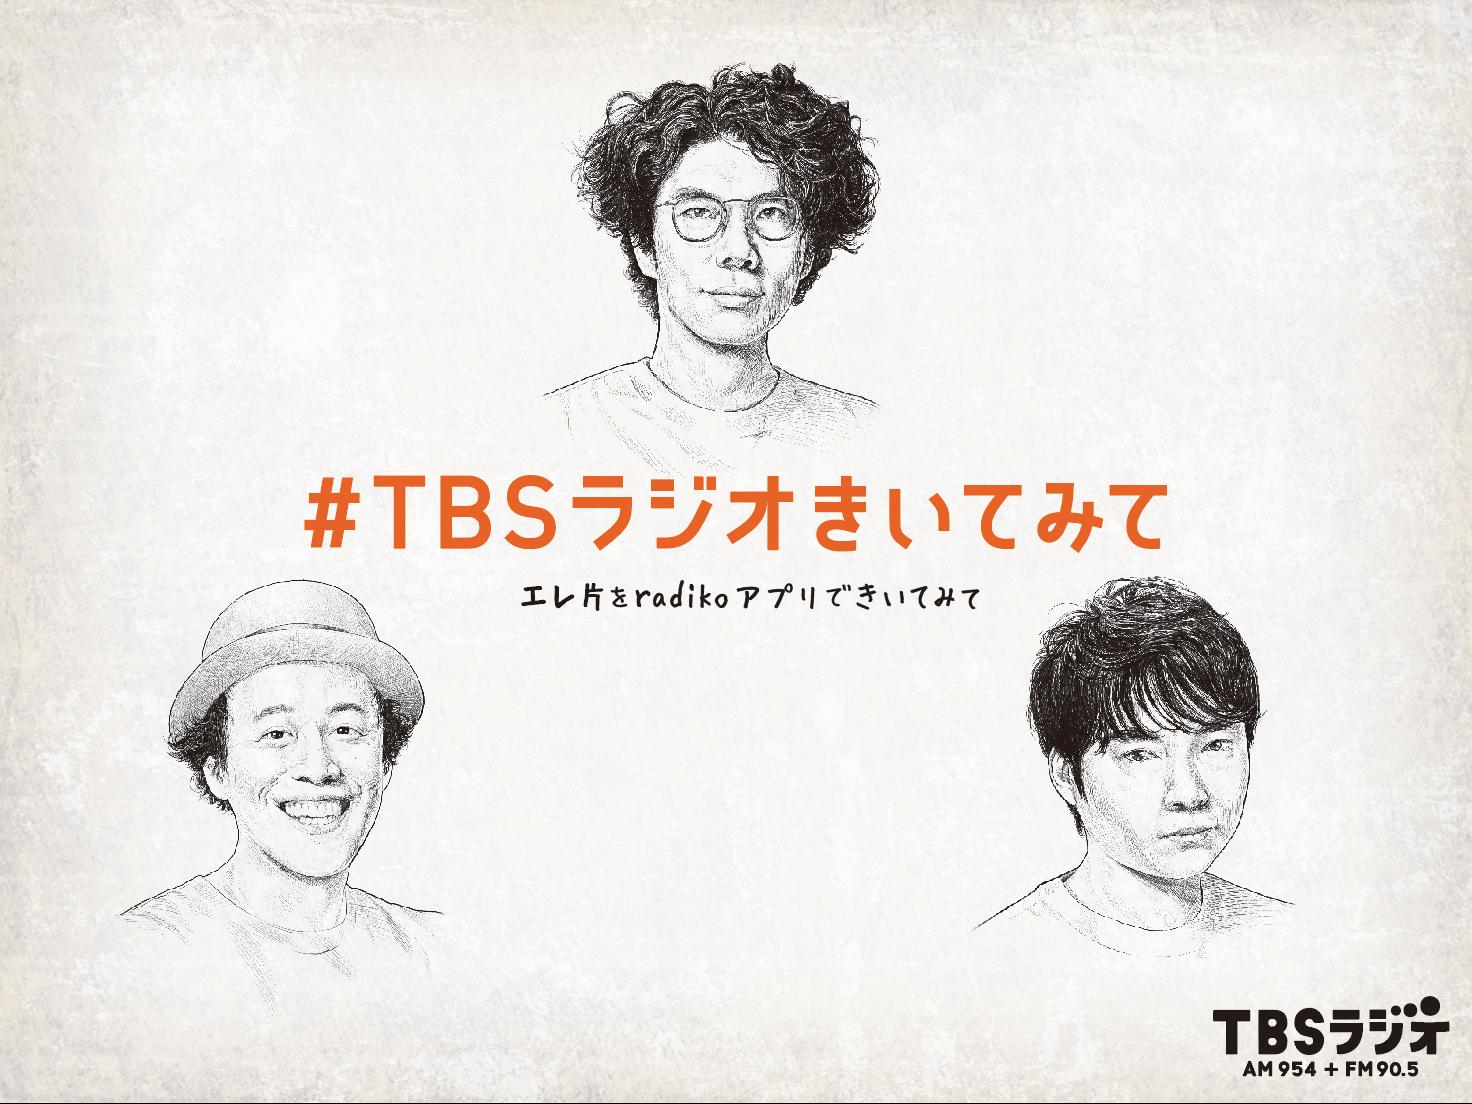 TBS RADIO / #TBSラジオきいてみて 広告キャンペーン3